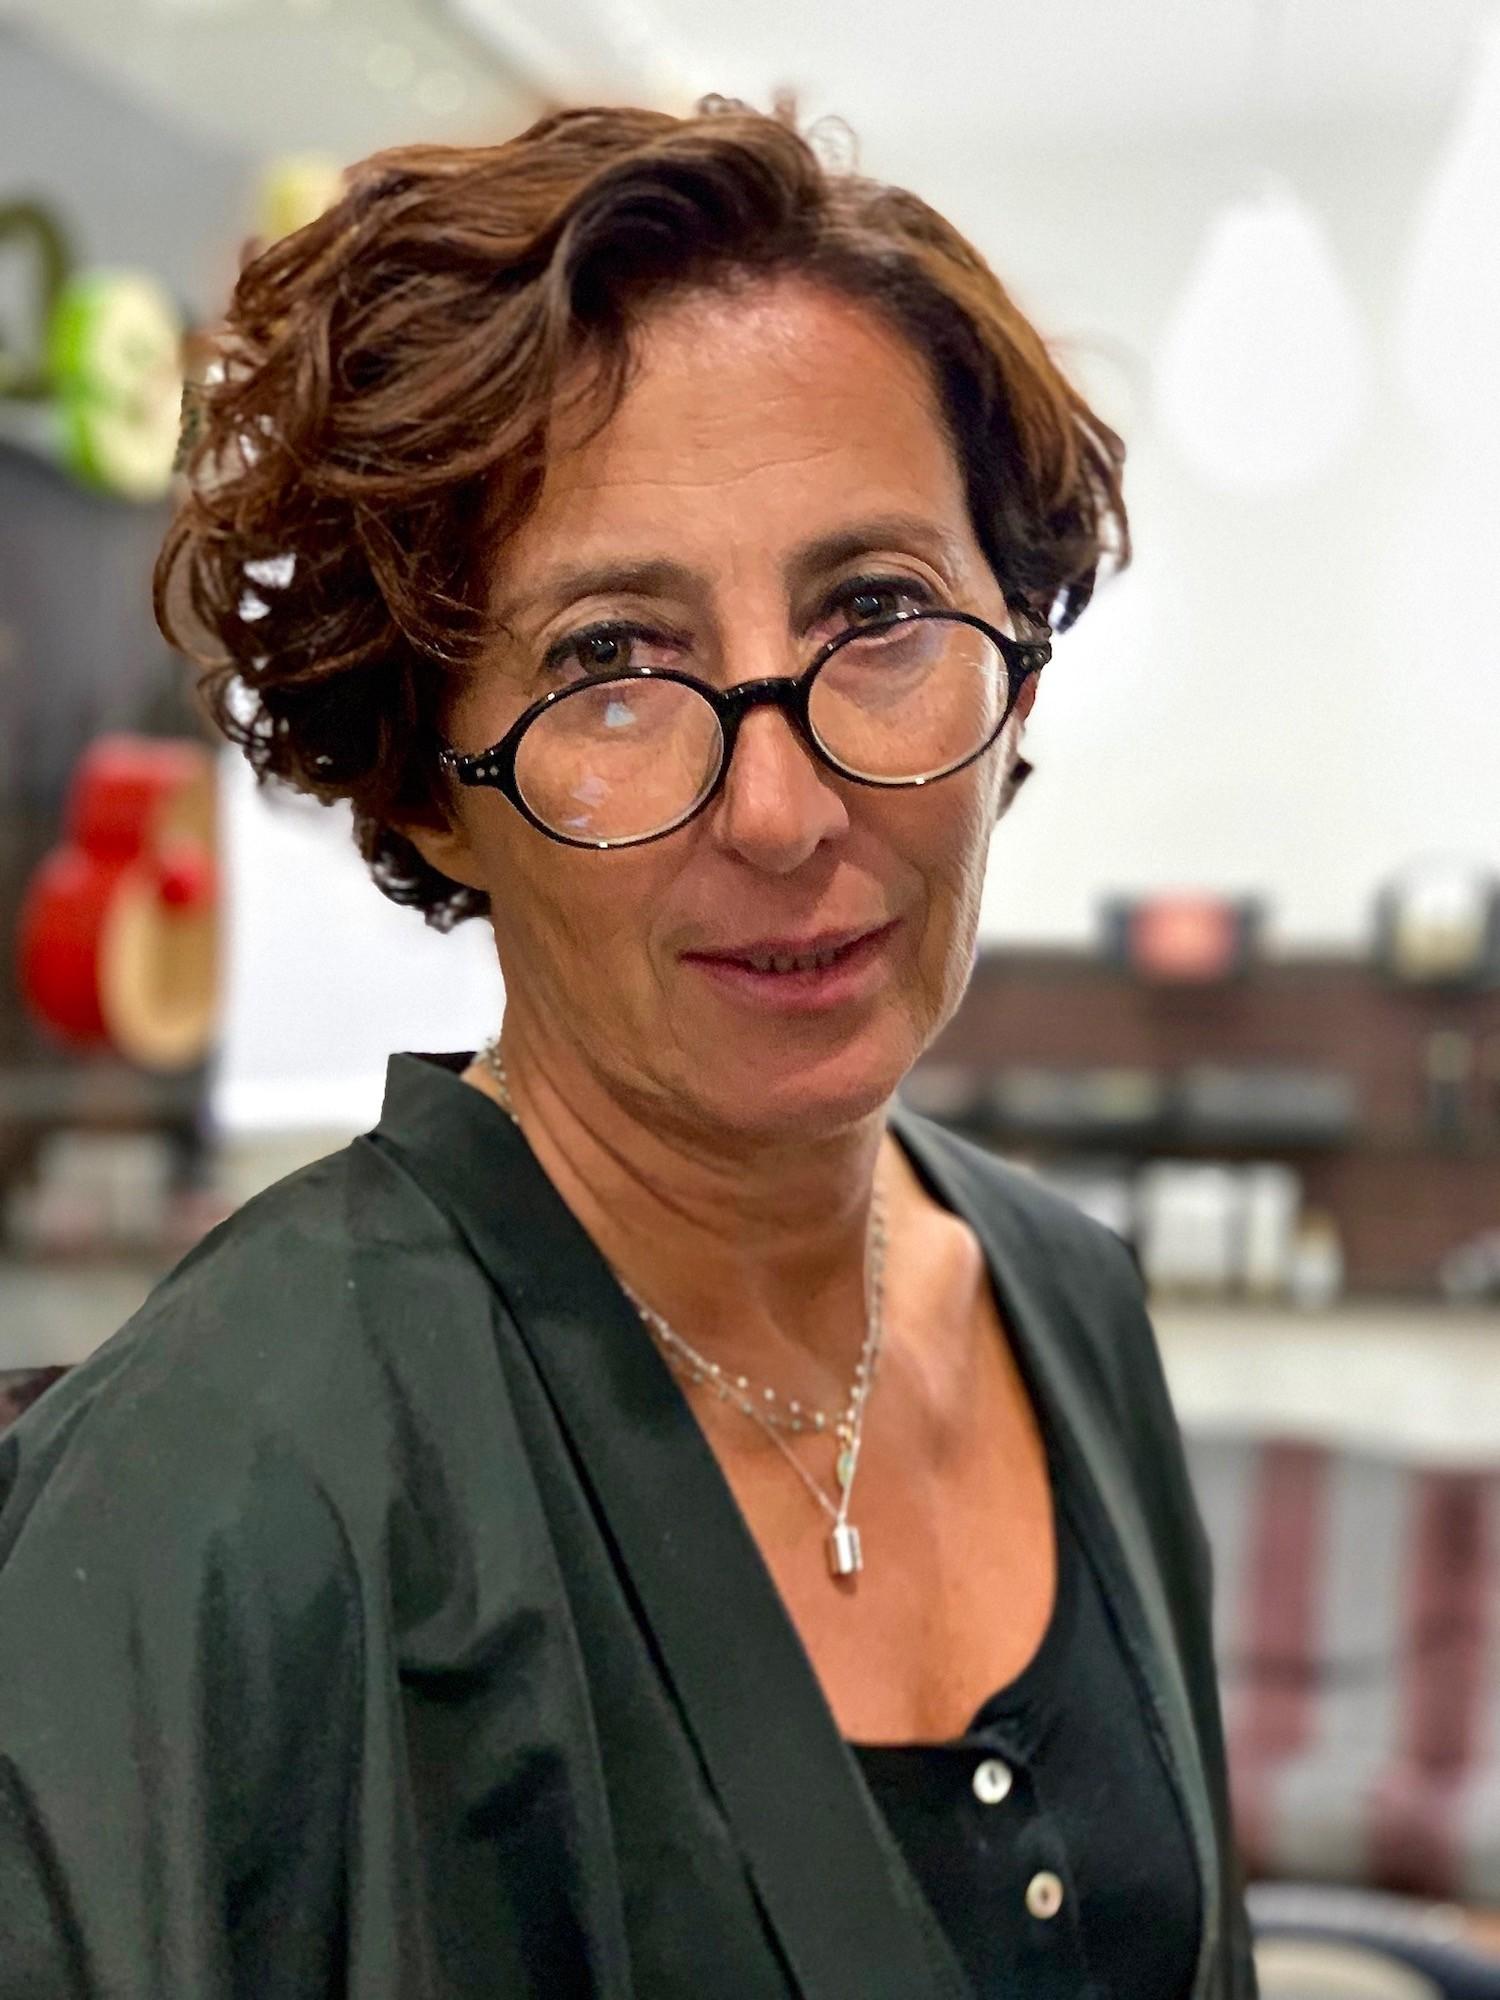 CAROLINE VACHERON